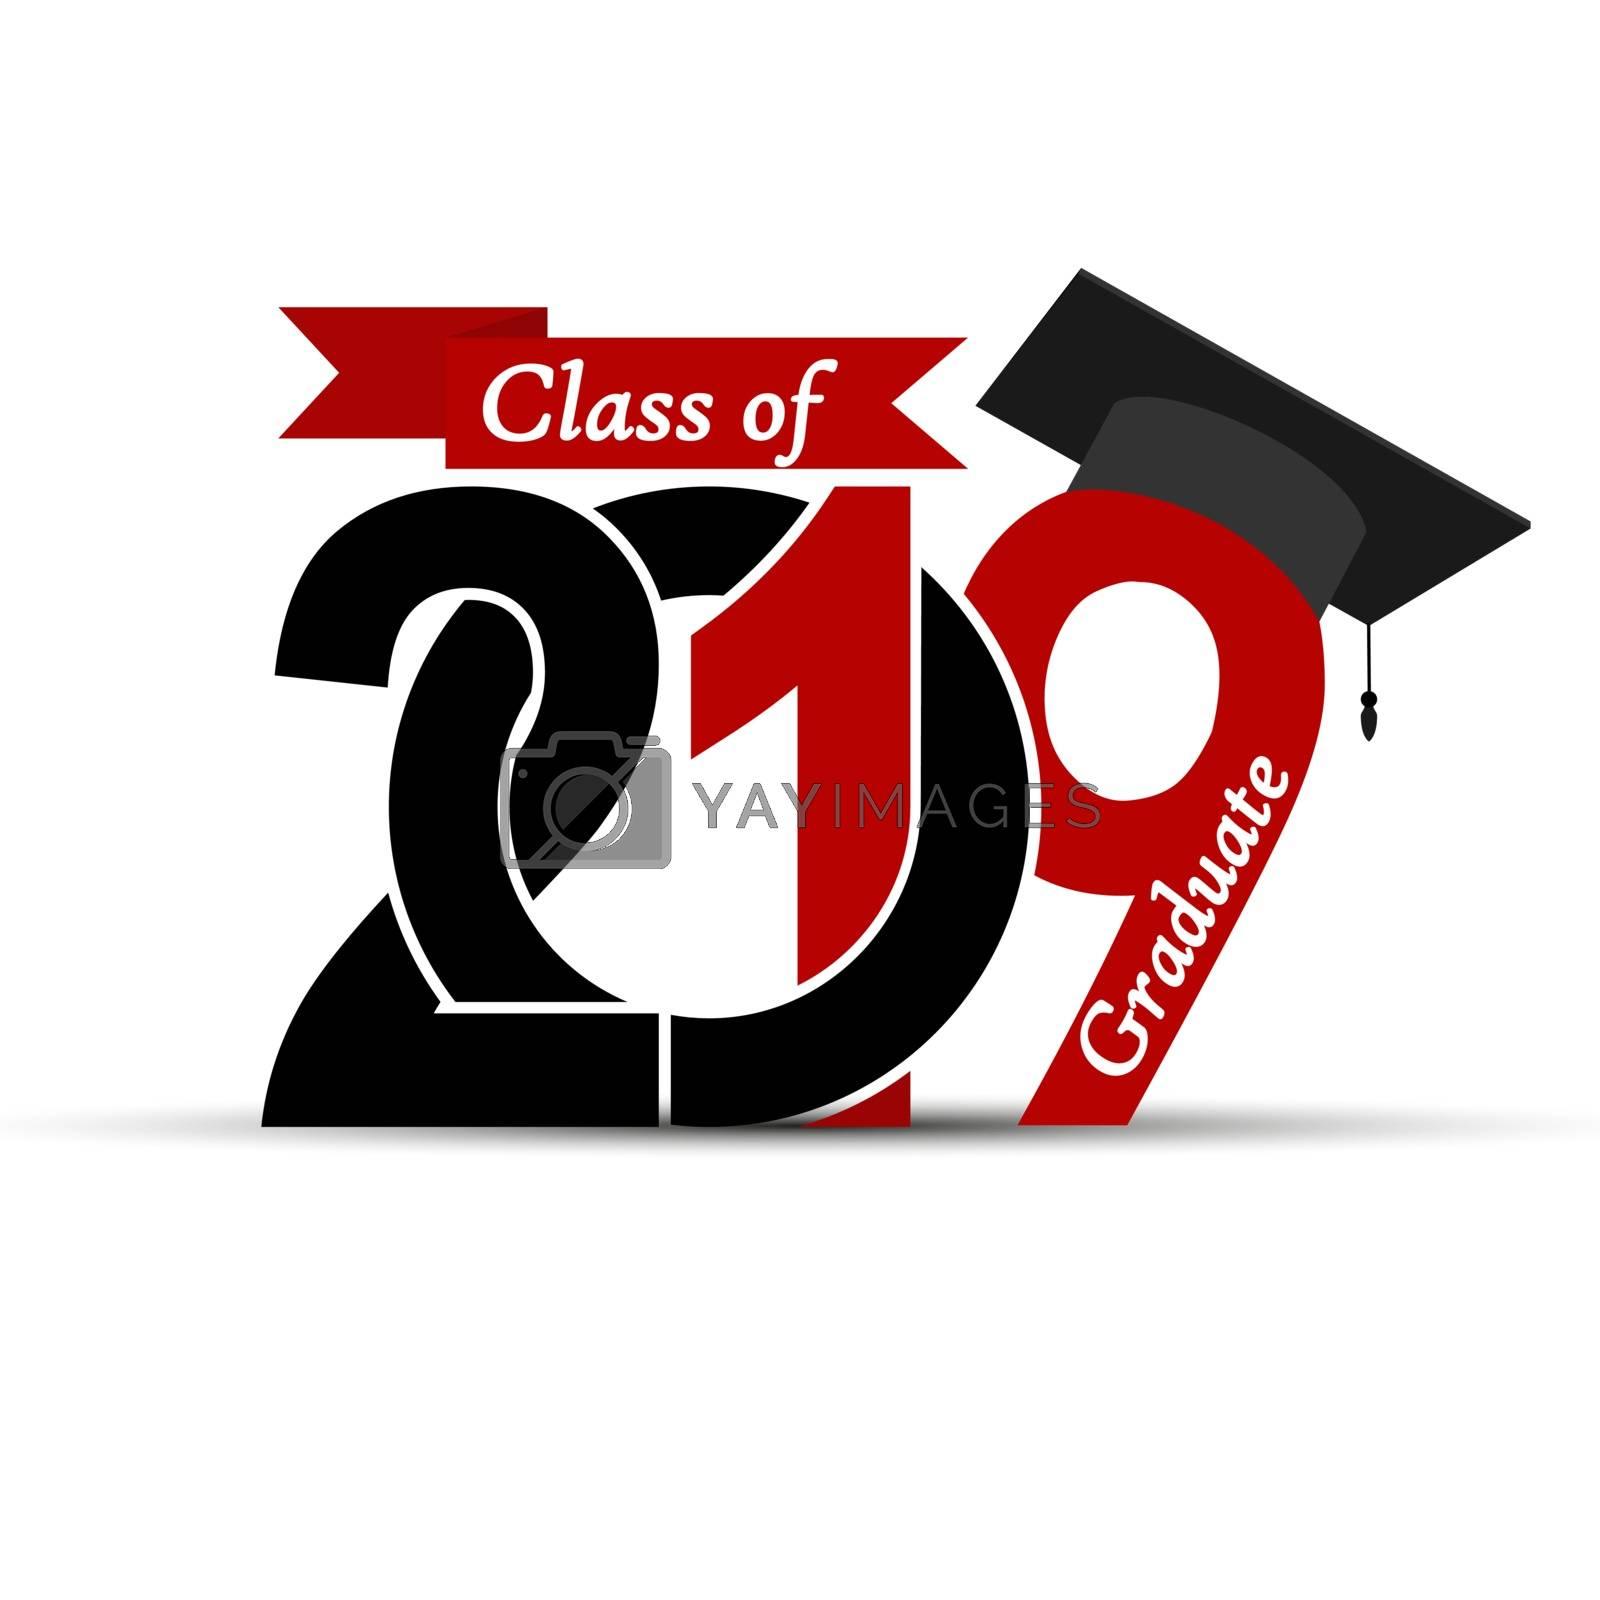 Class and graduate 2019 with a graduate cap.